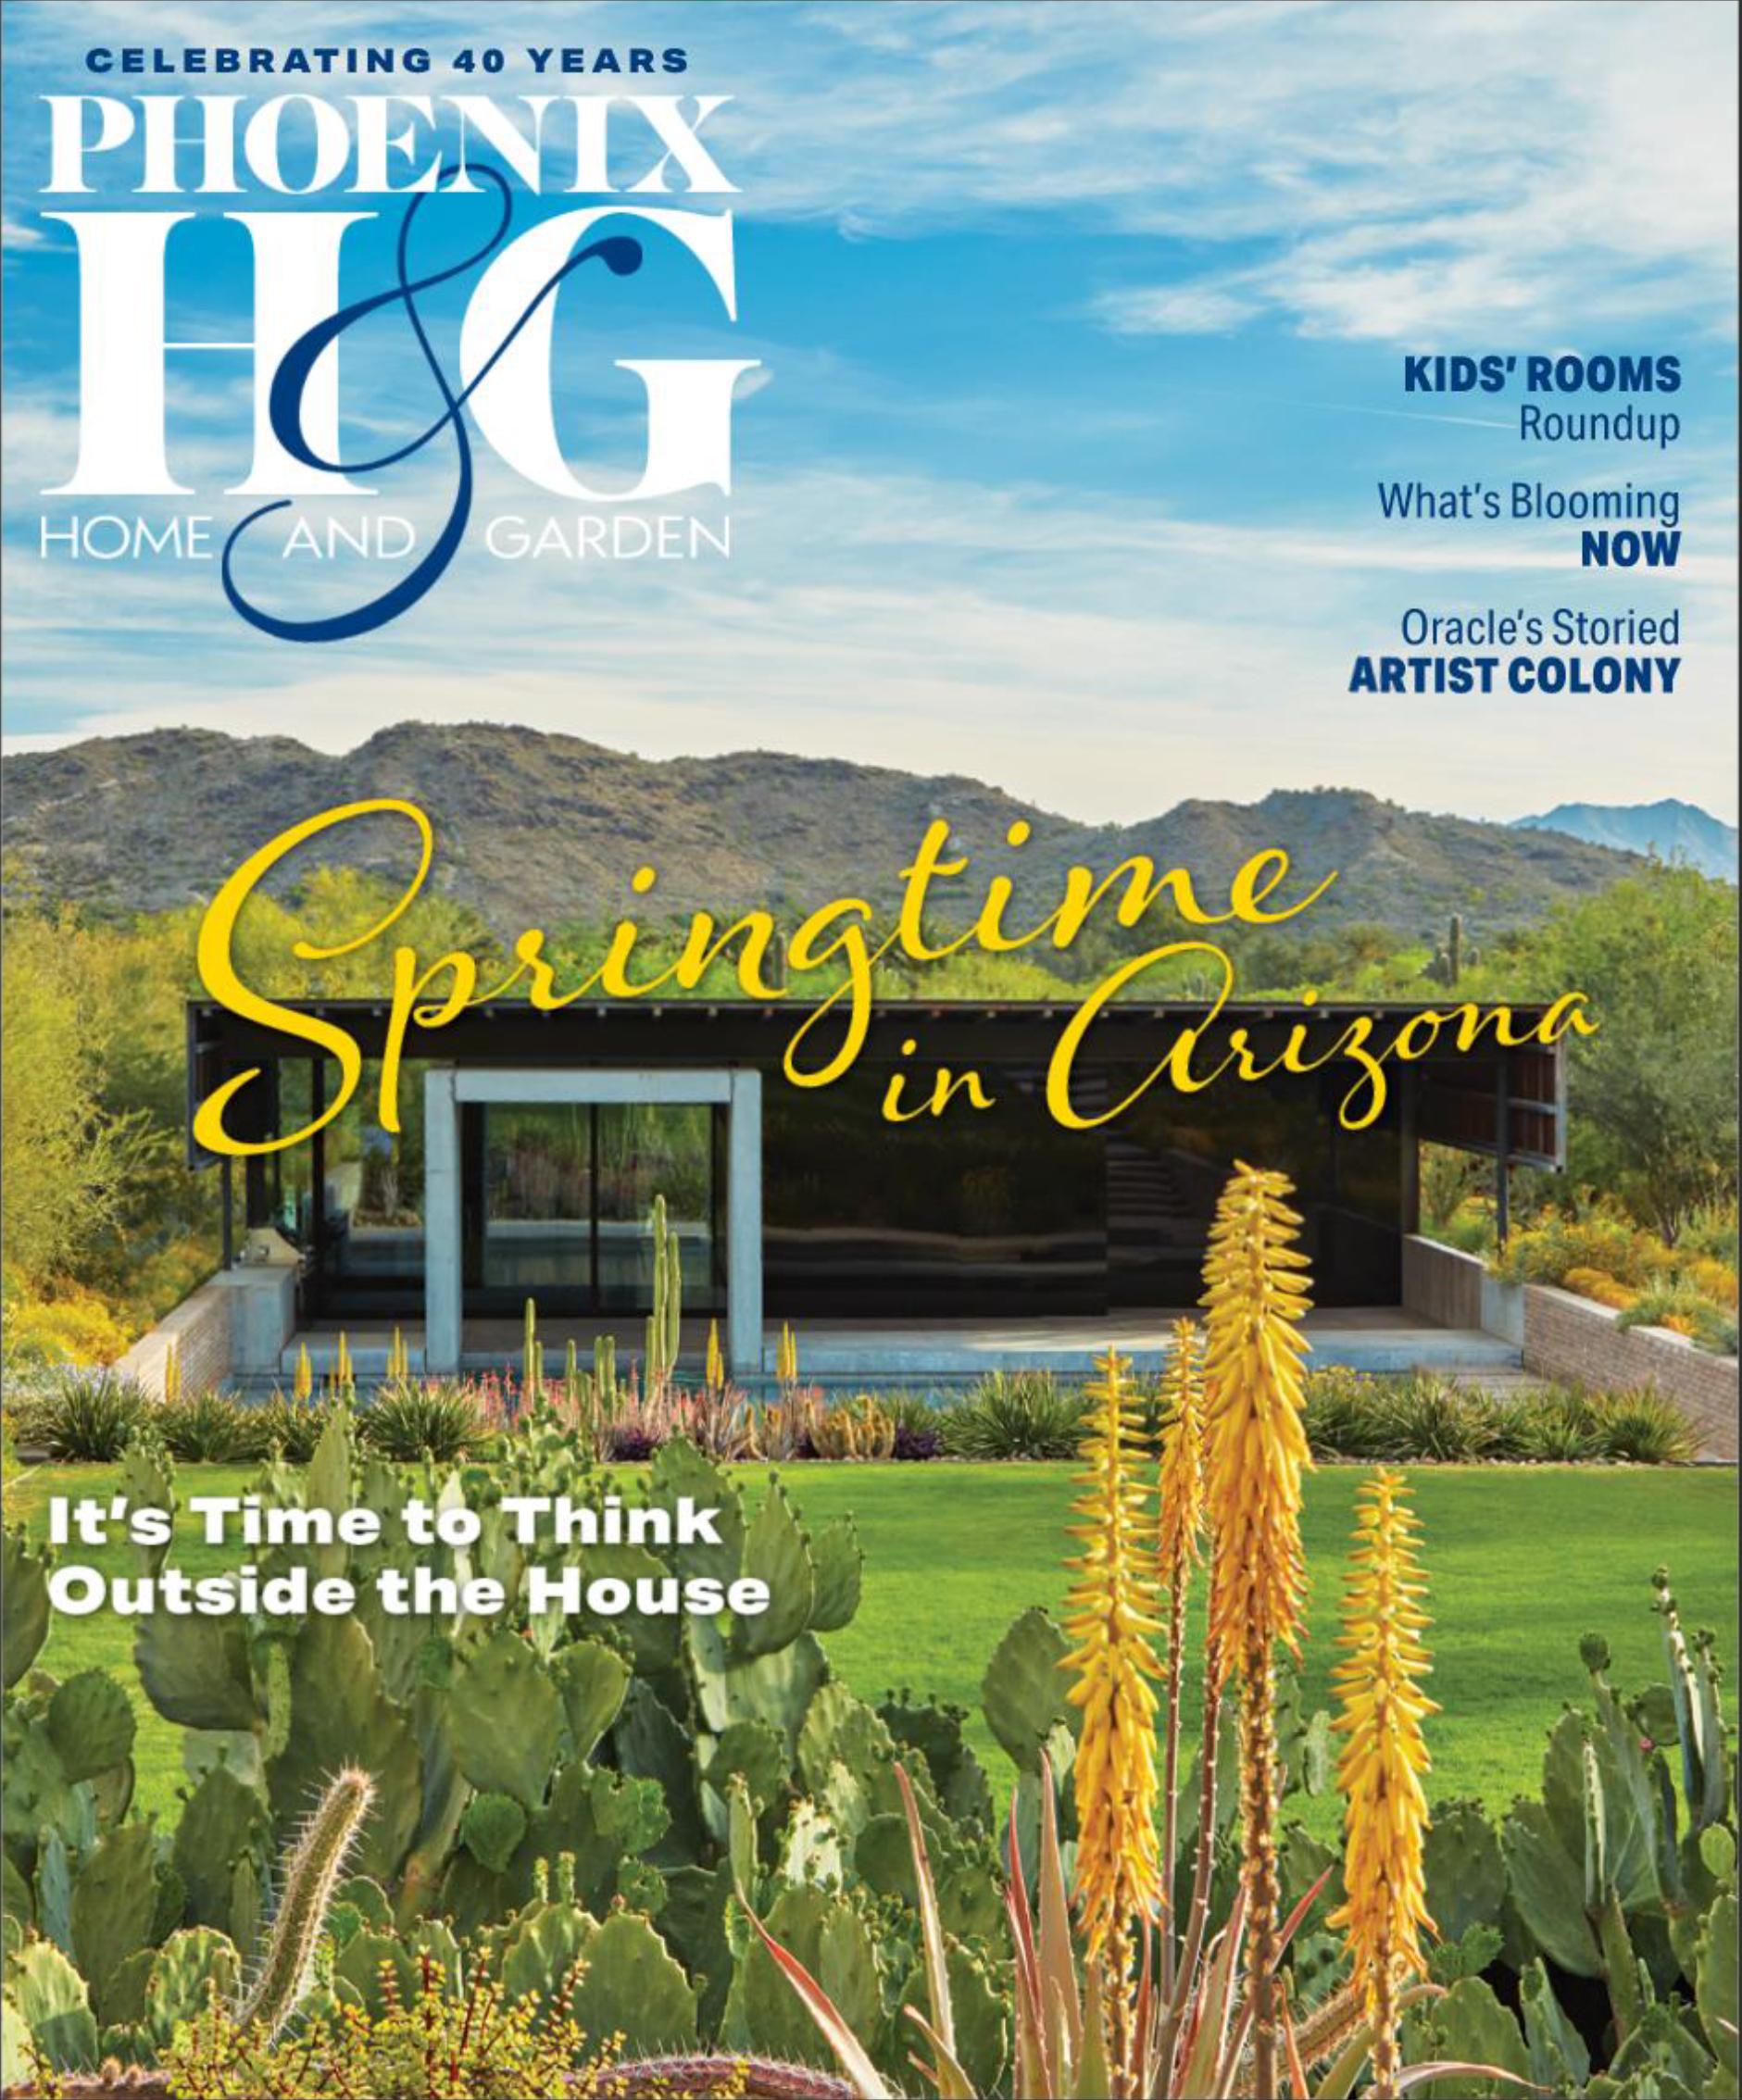 Phoenix Home & Garden: Springtime in Arizona